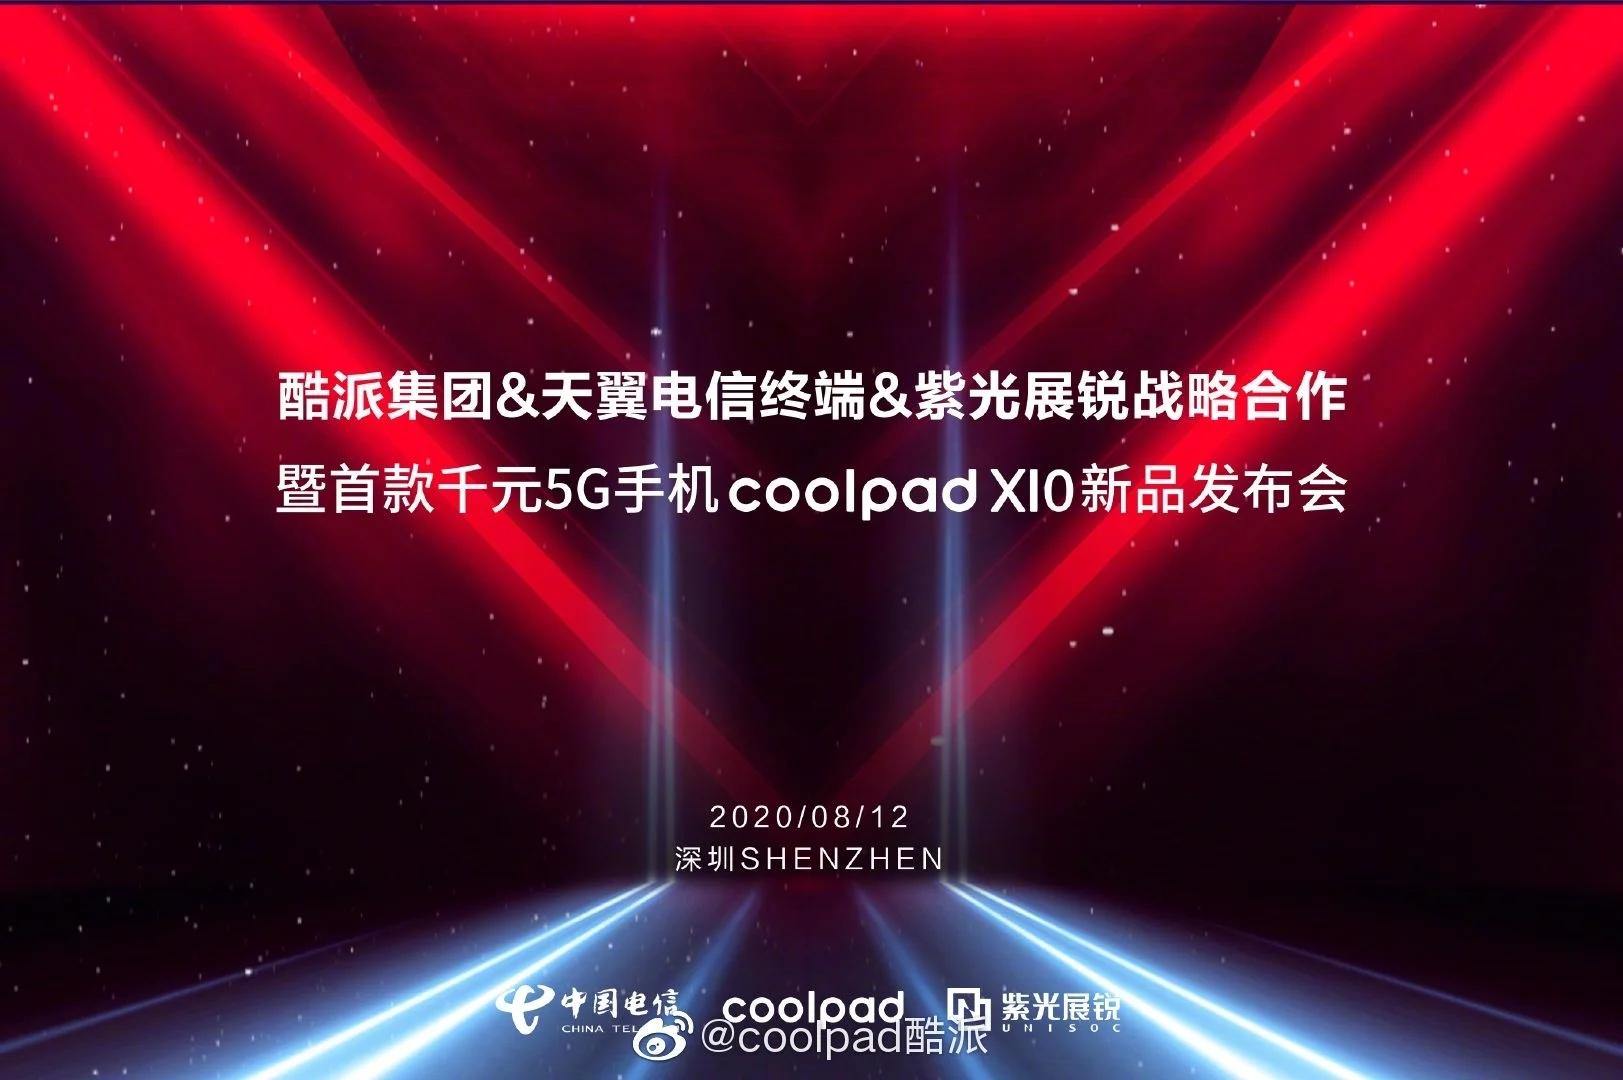 coolpad-x10-teaser